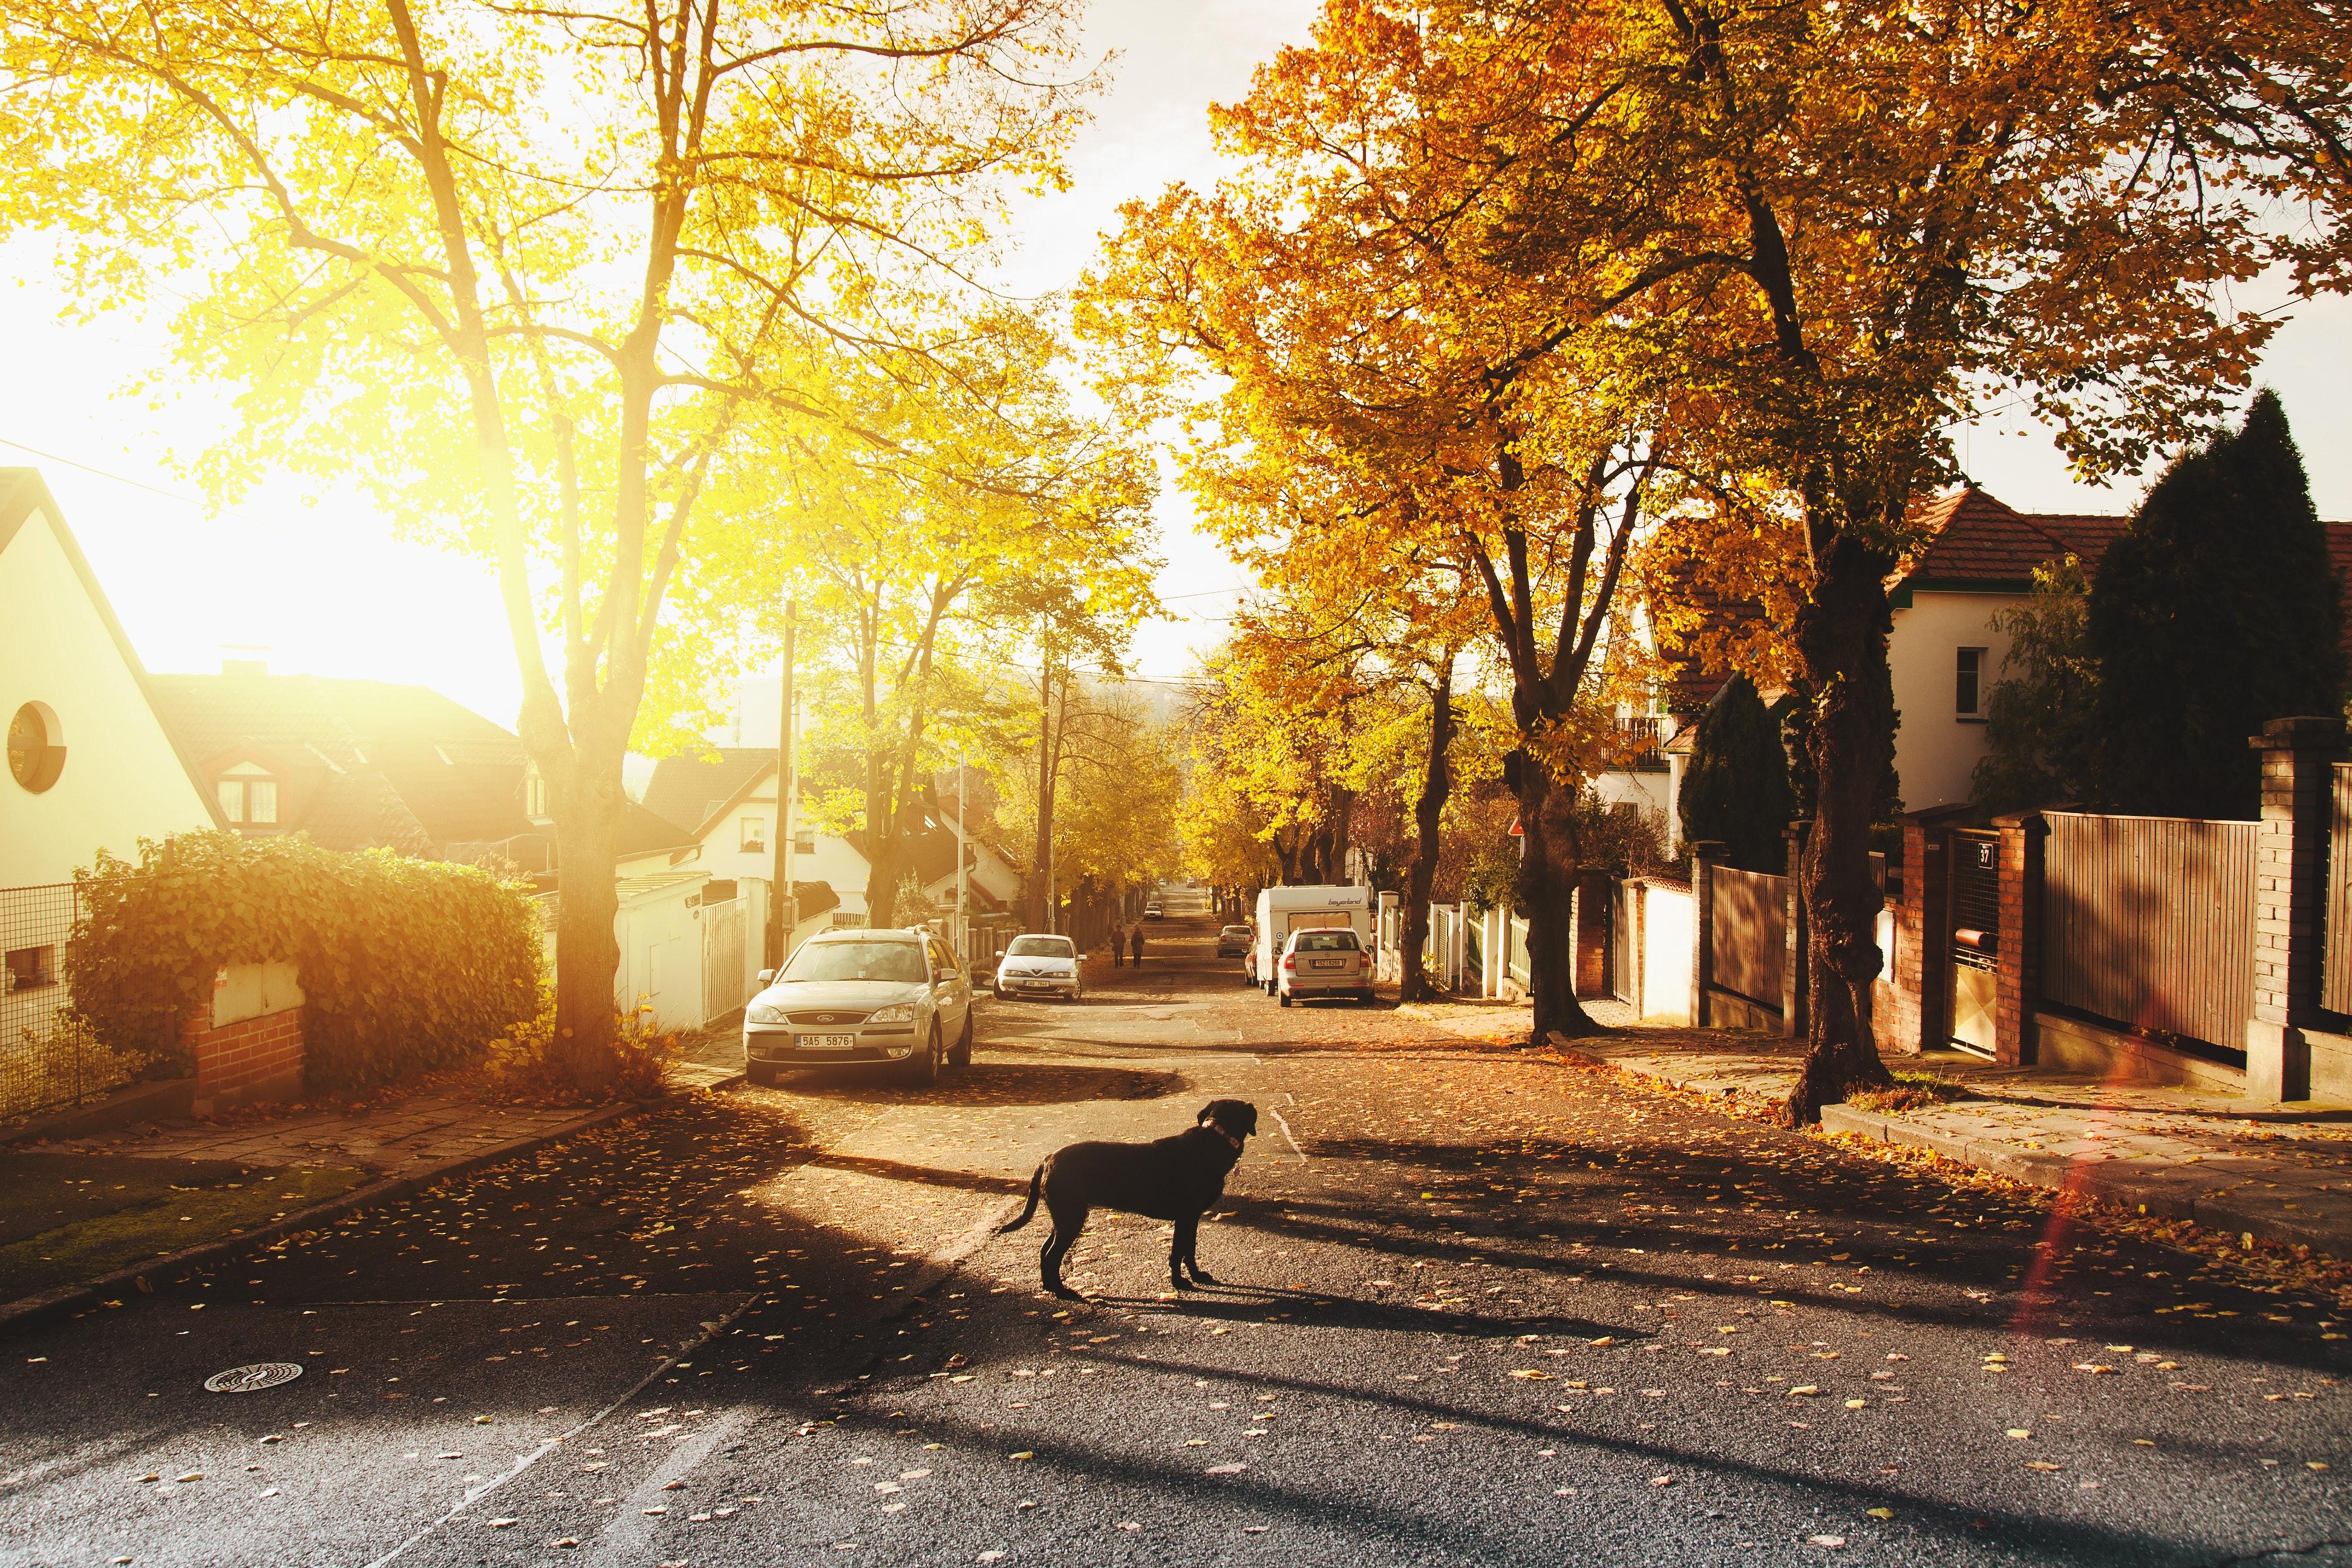 Dog on concrete road photo